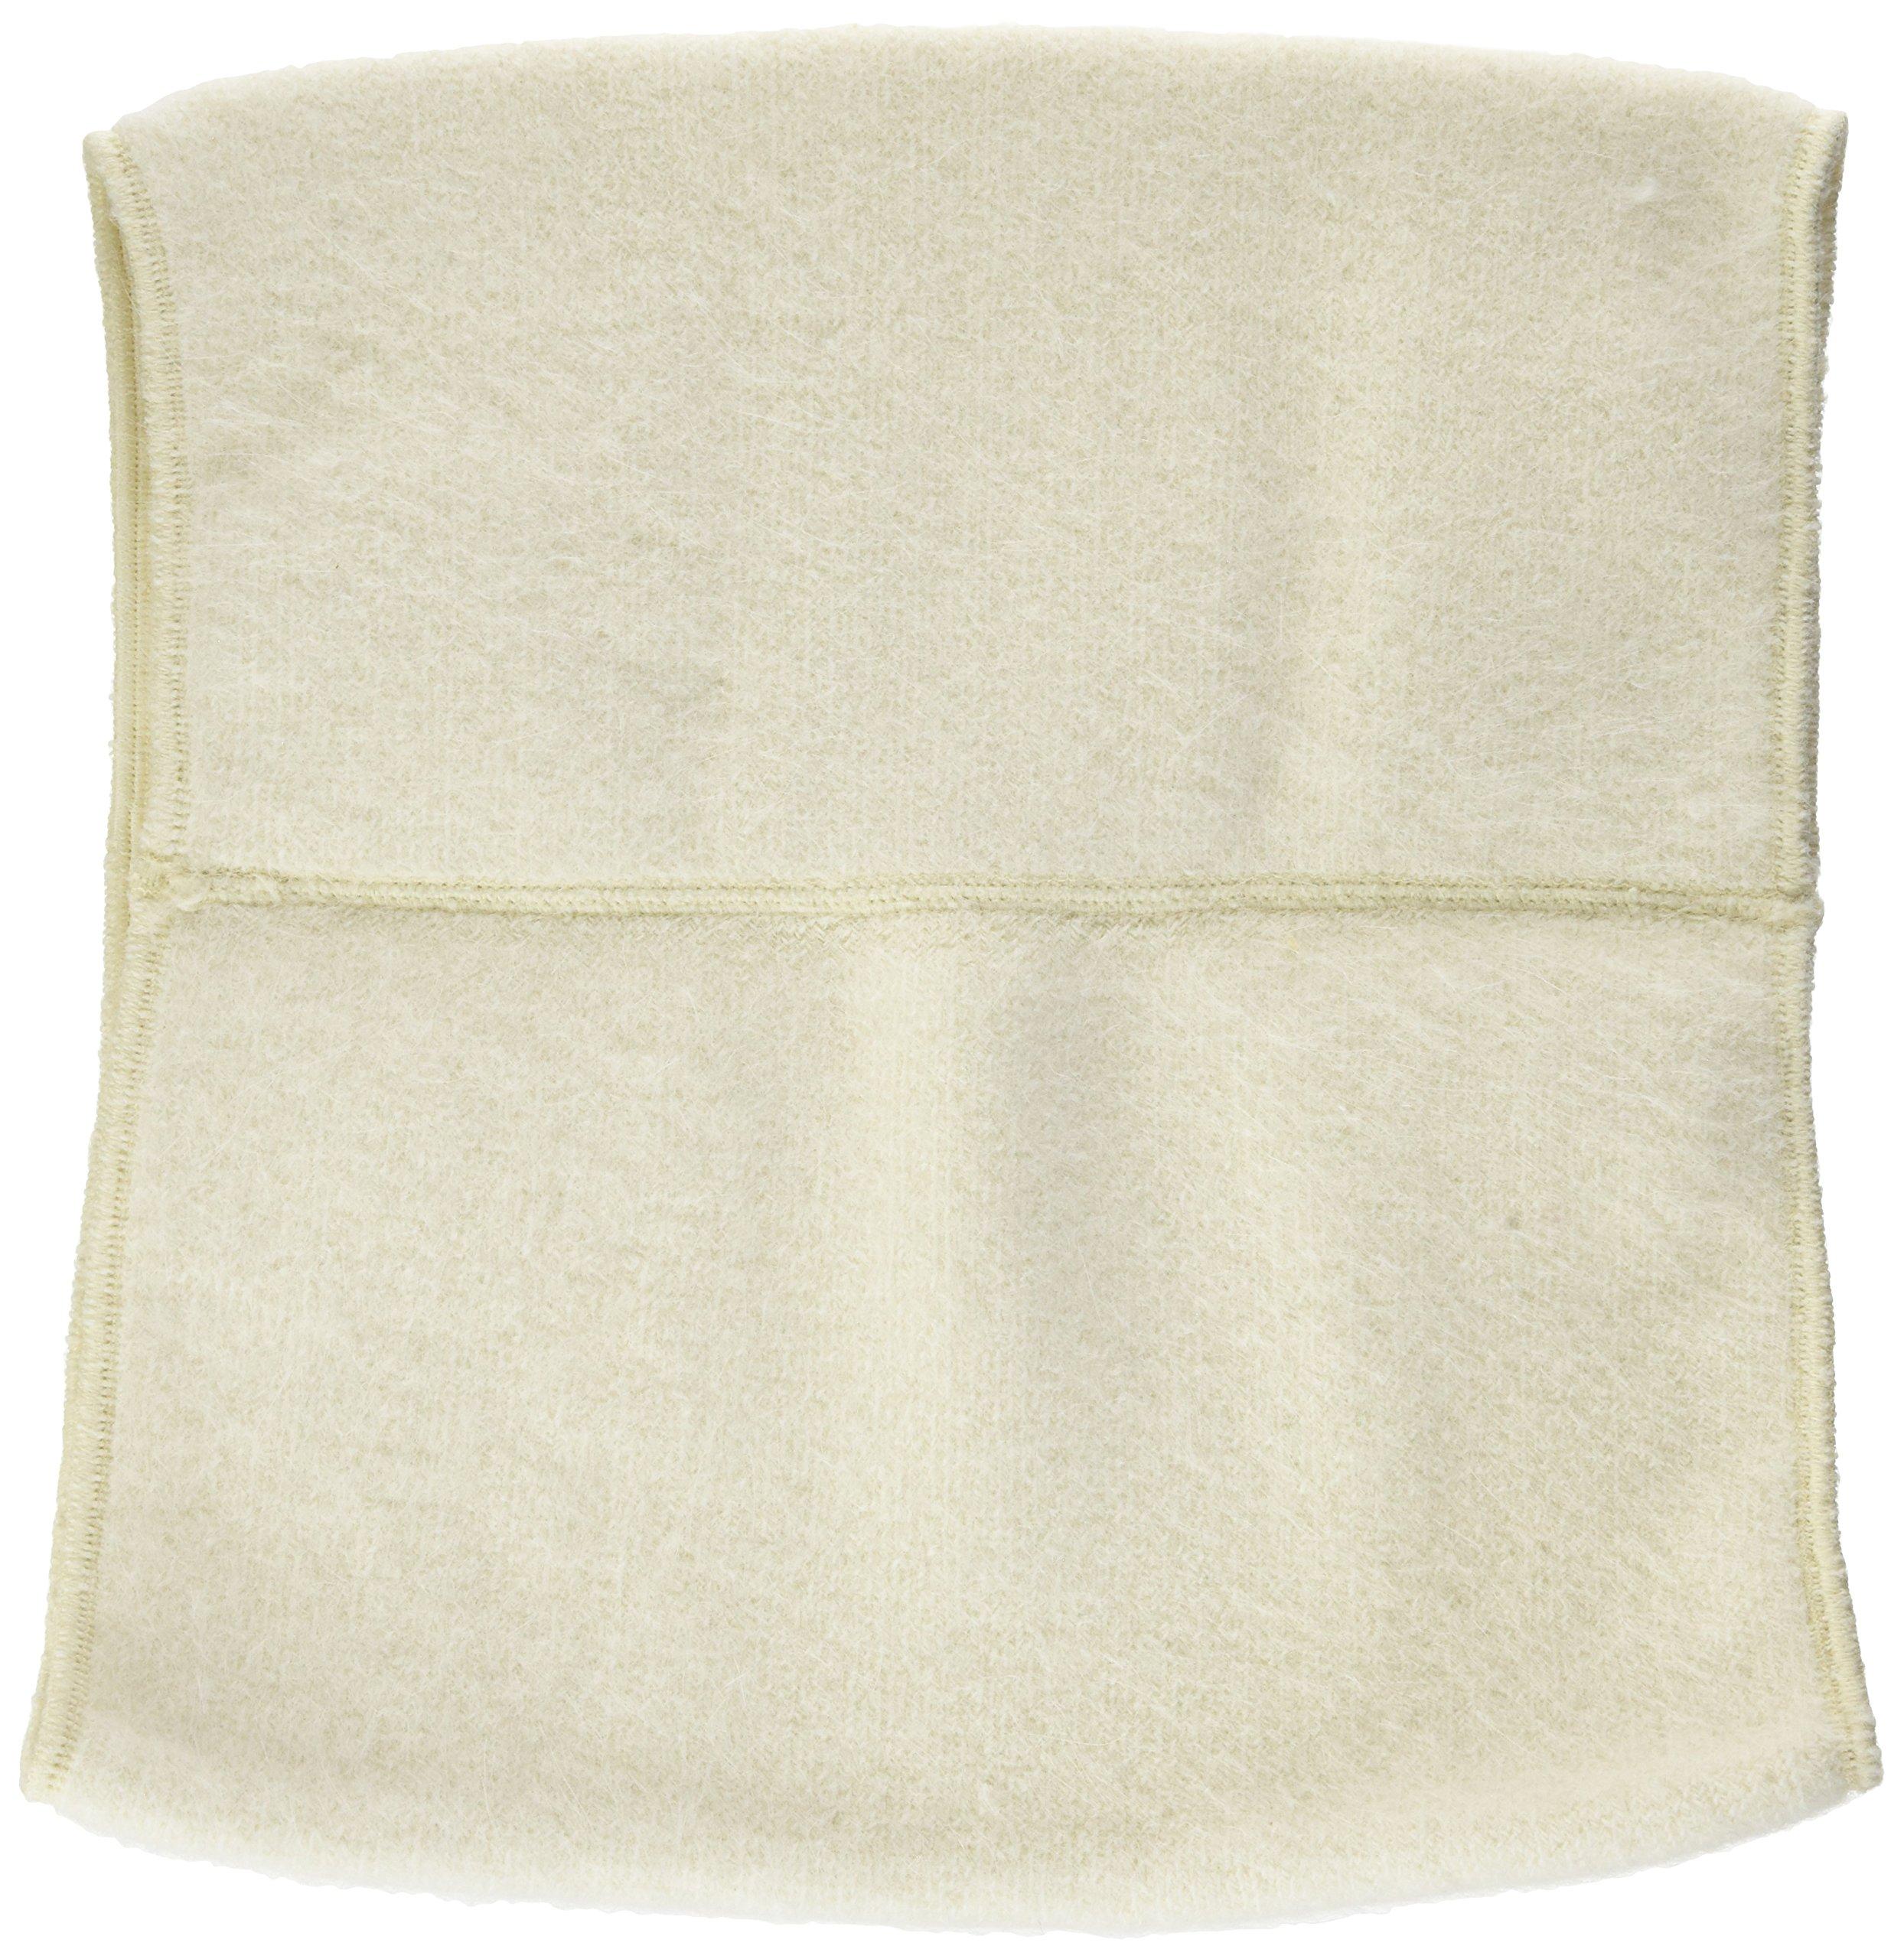 OTC Back Warmer Angora Arthritis Relief, White, Small